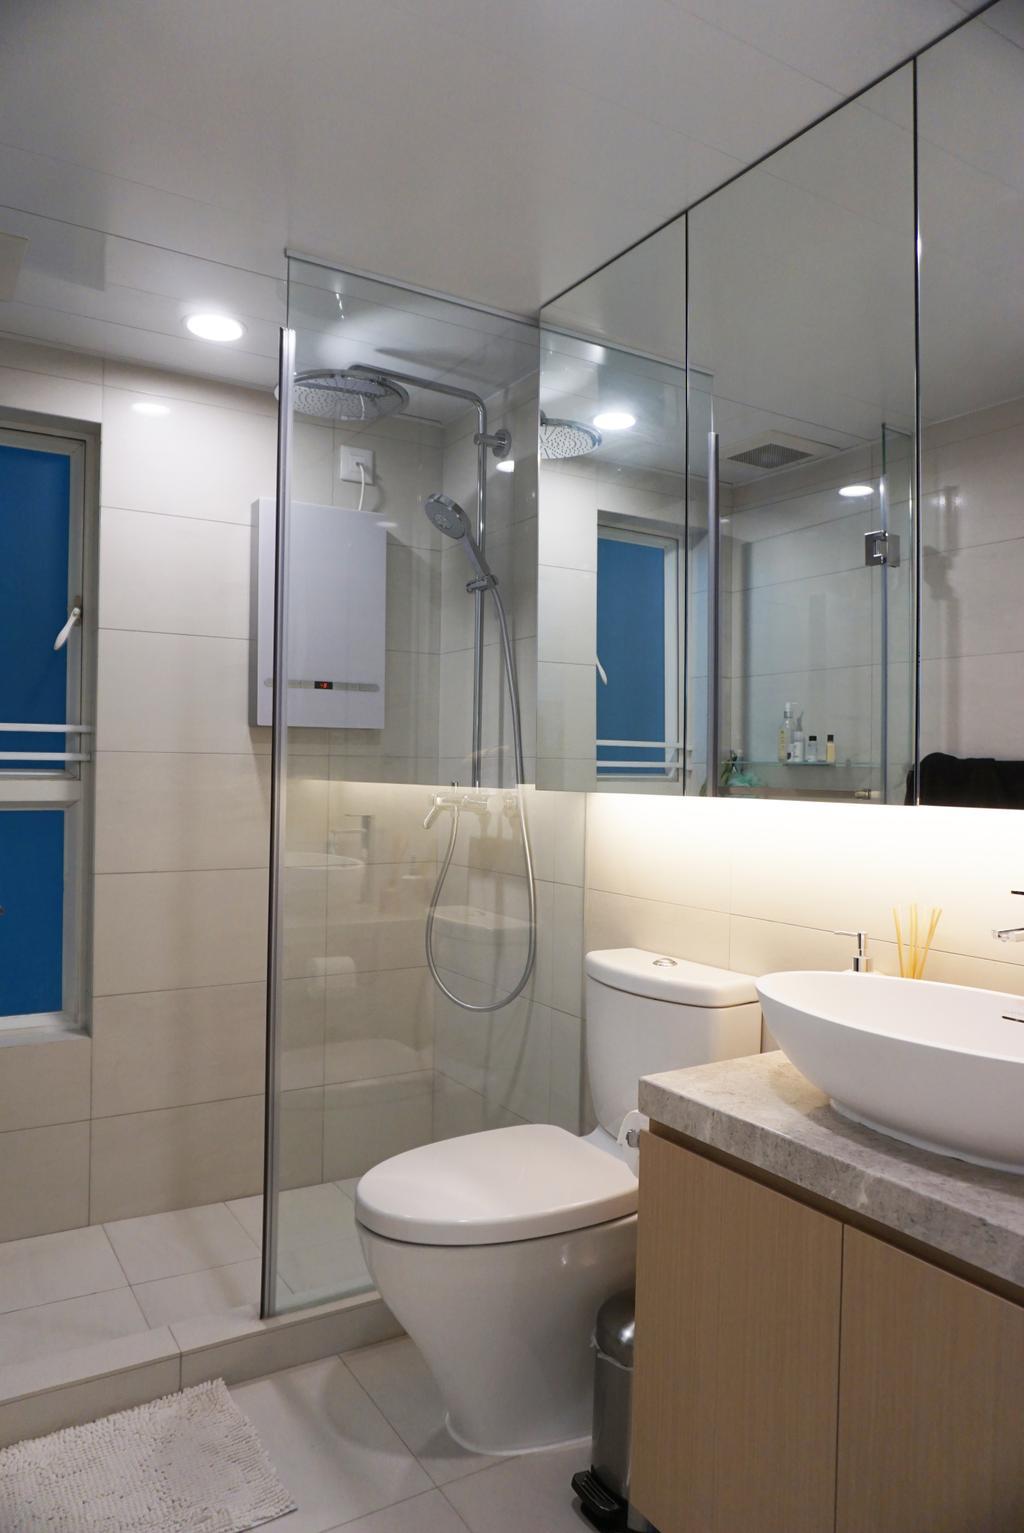 私家樓, 浴室, 觀瀾雅軒, 室內設計師, AQUA Projects